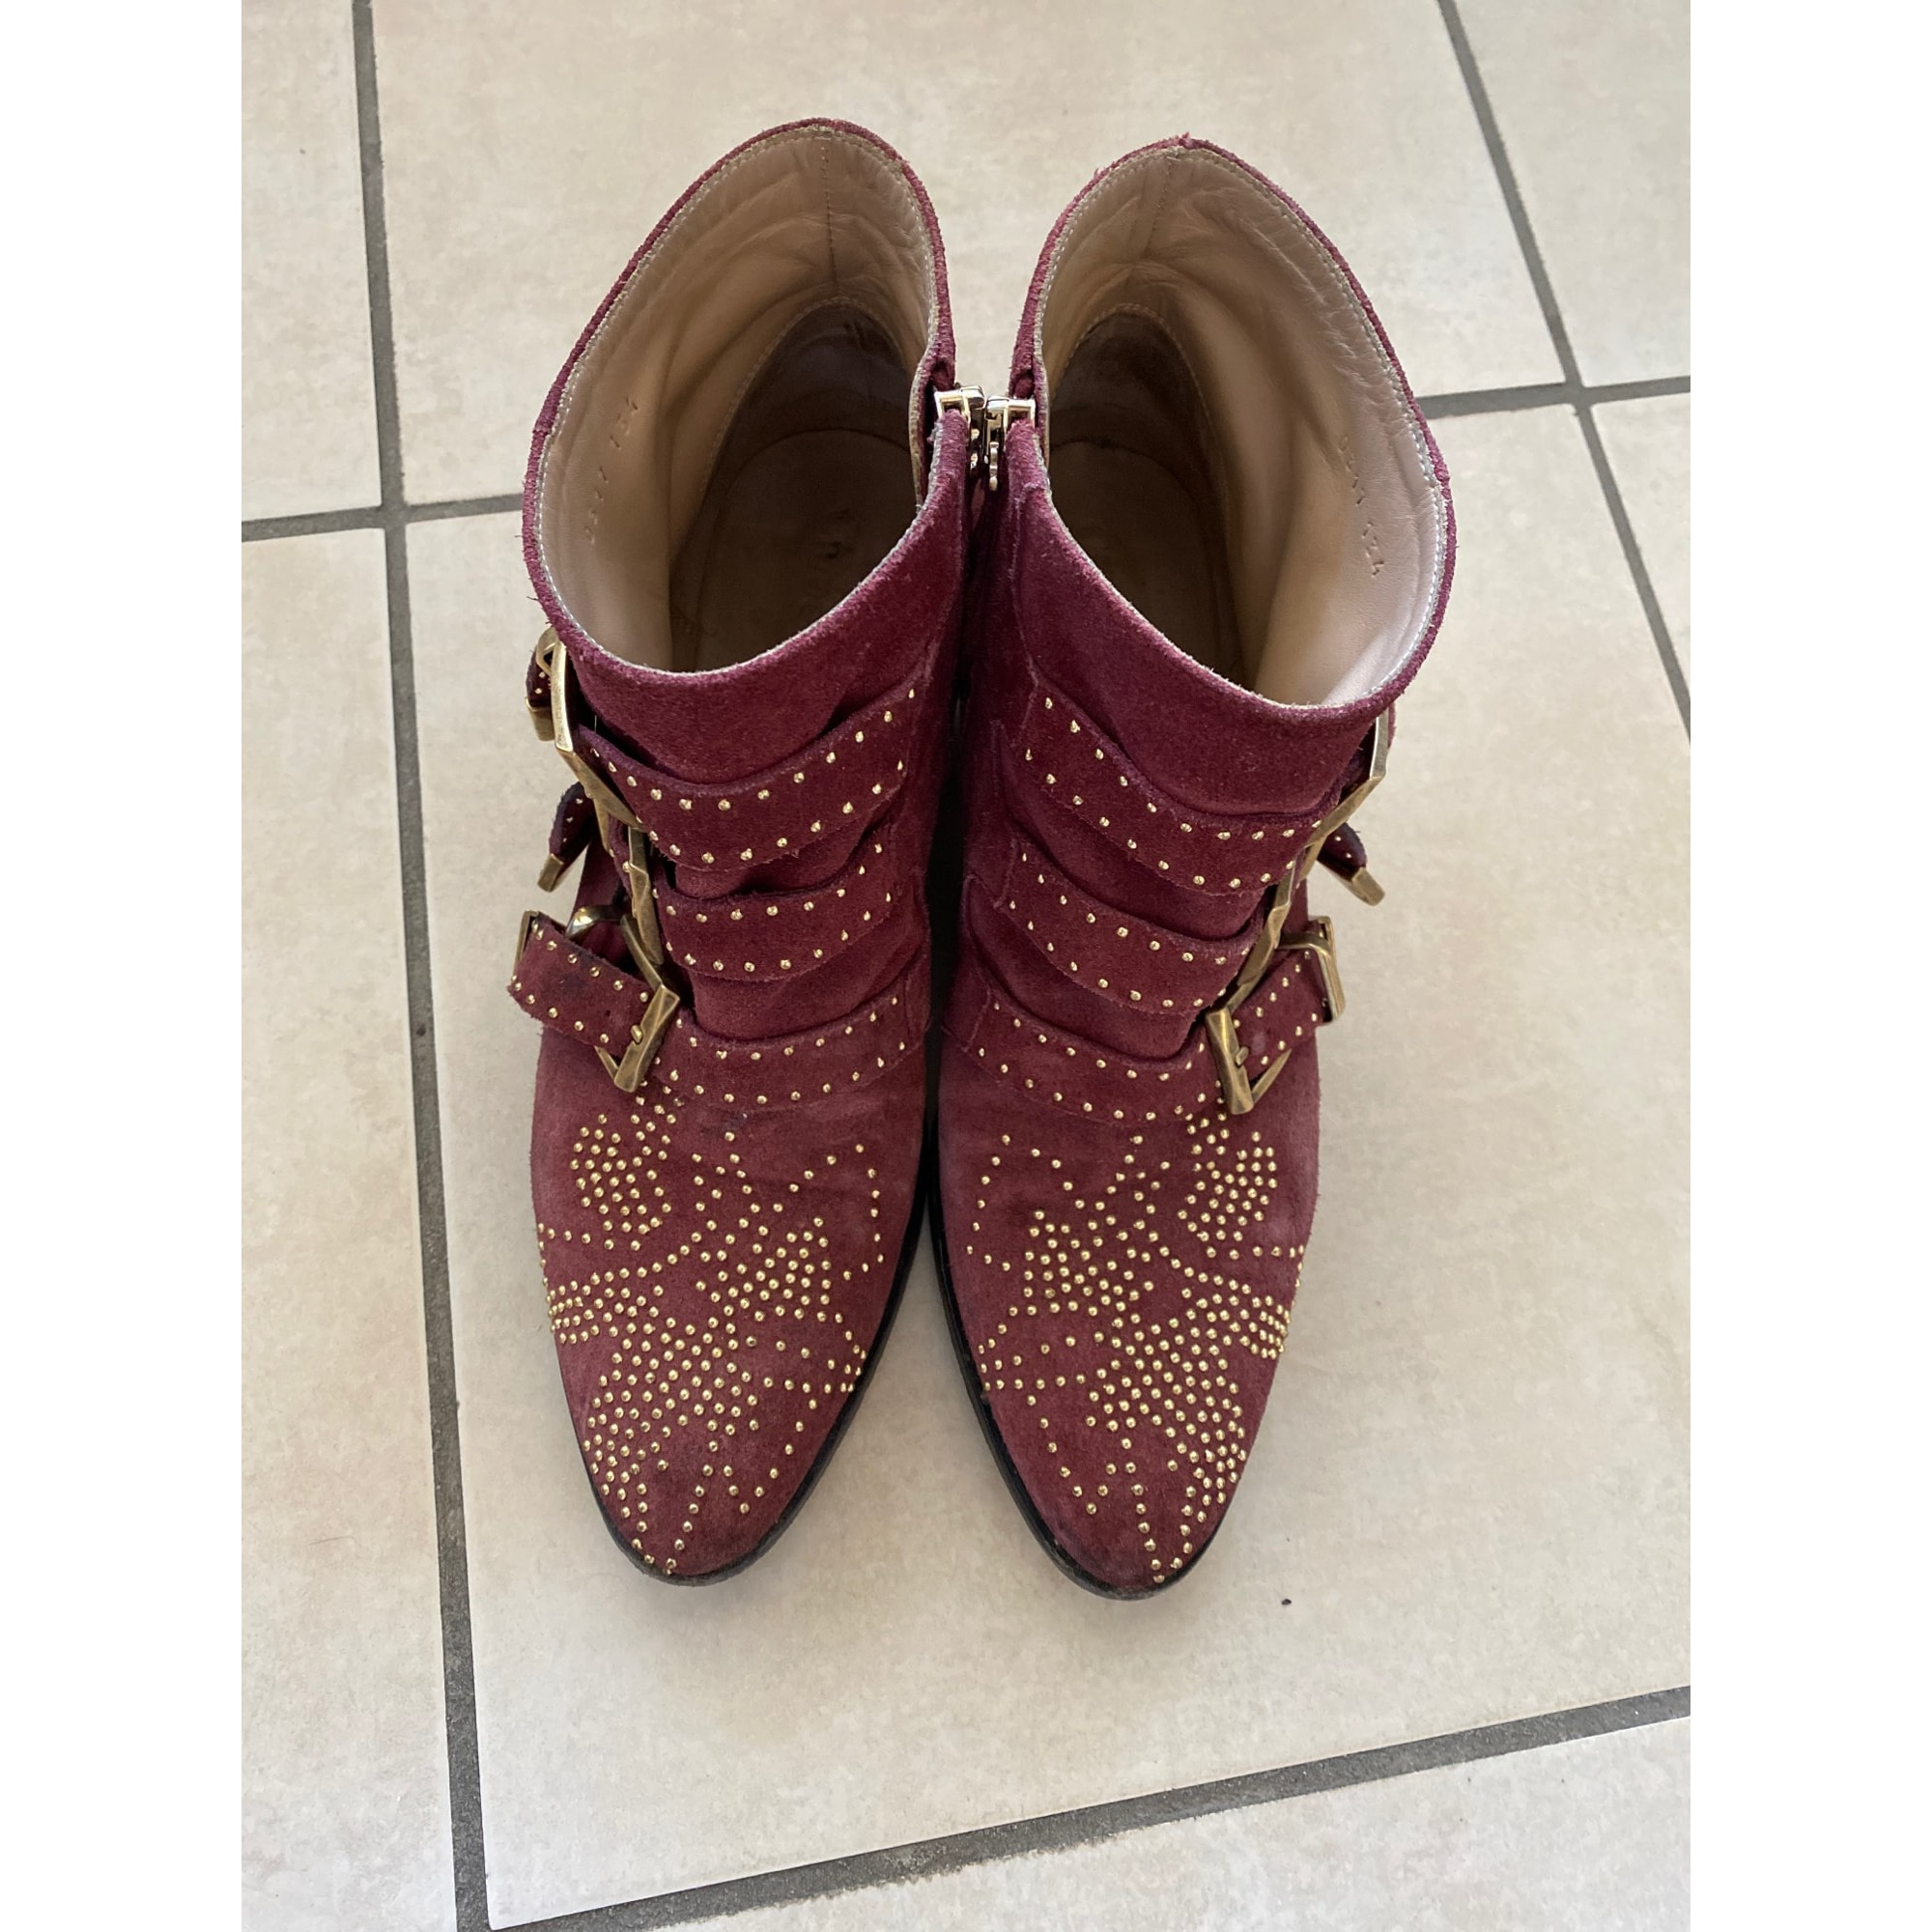 Cowboy Ankle Boots CHLOÉ Susanna Red, burgundy